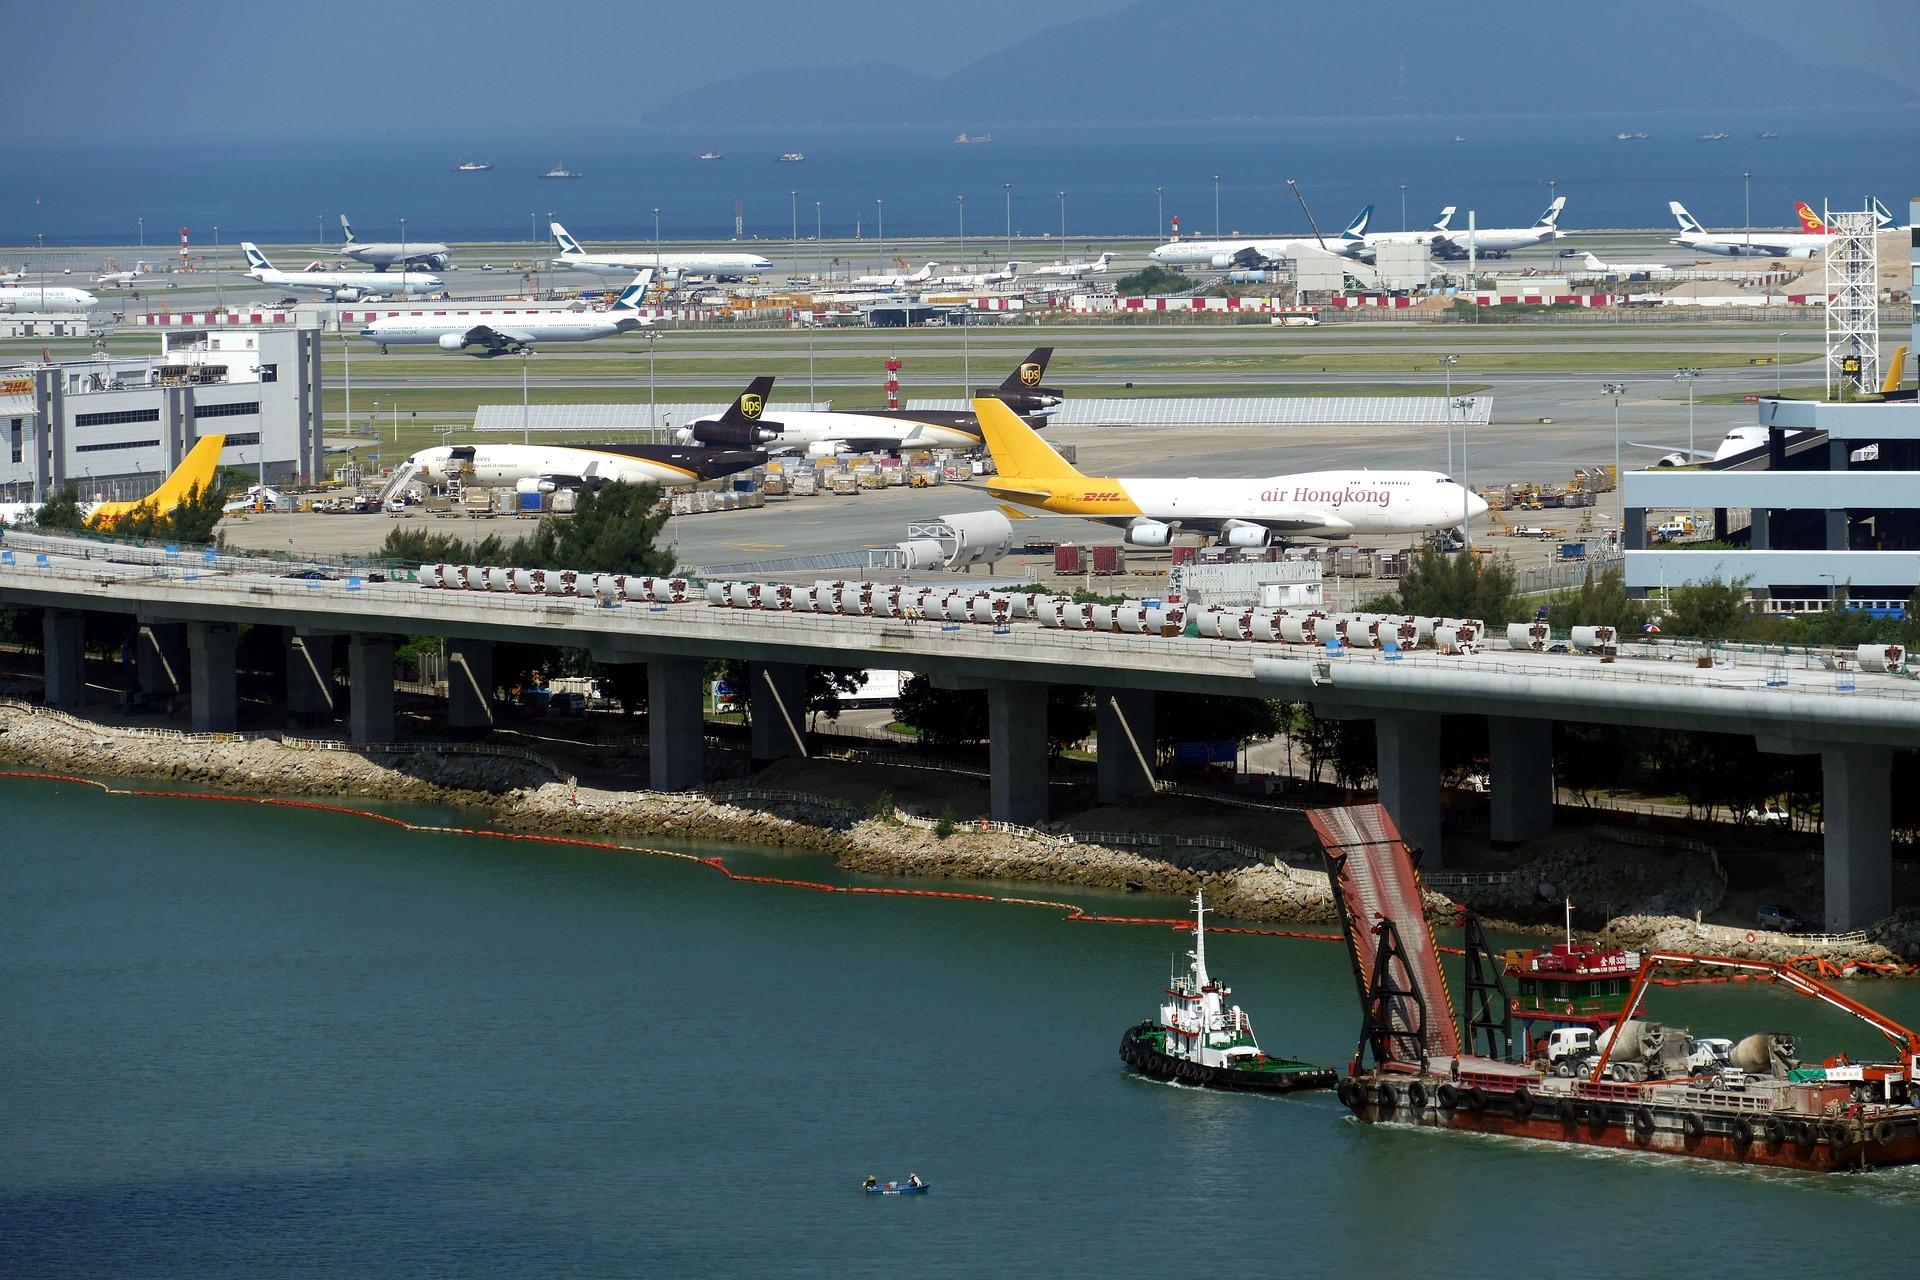 Hkia Opens Check In Services At Hong Kong Zhuhai Macao Bridge Passenger Terminal Today